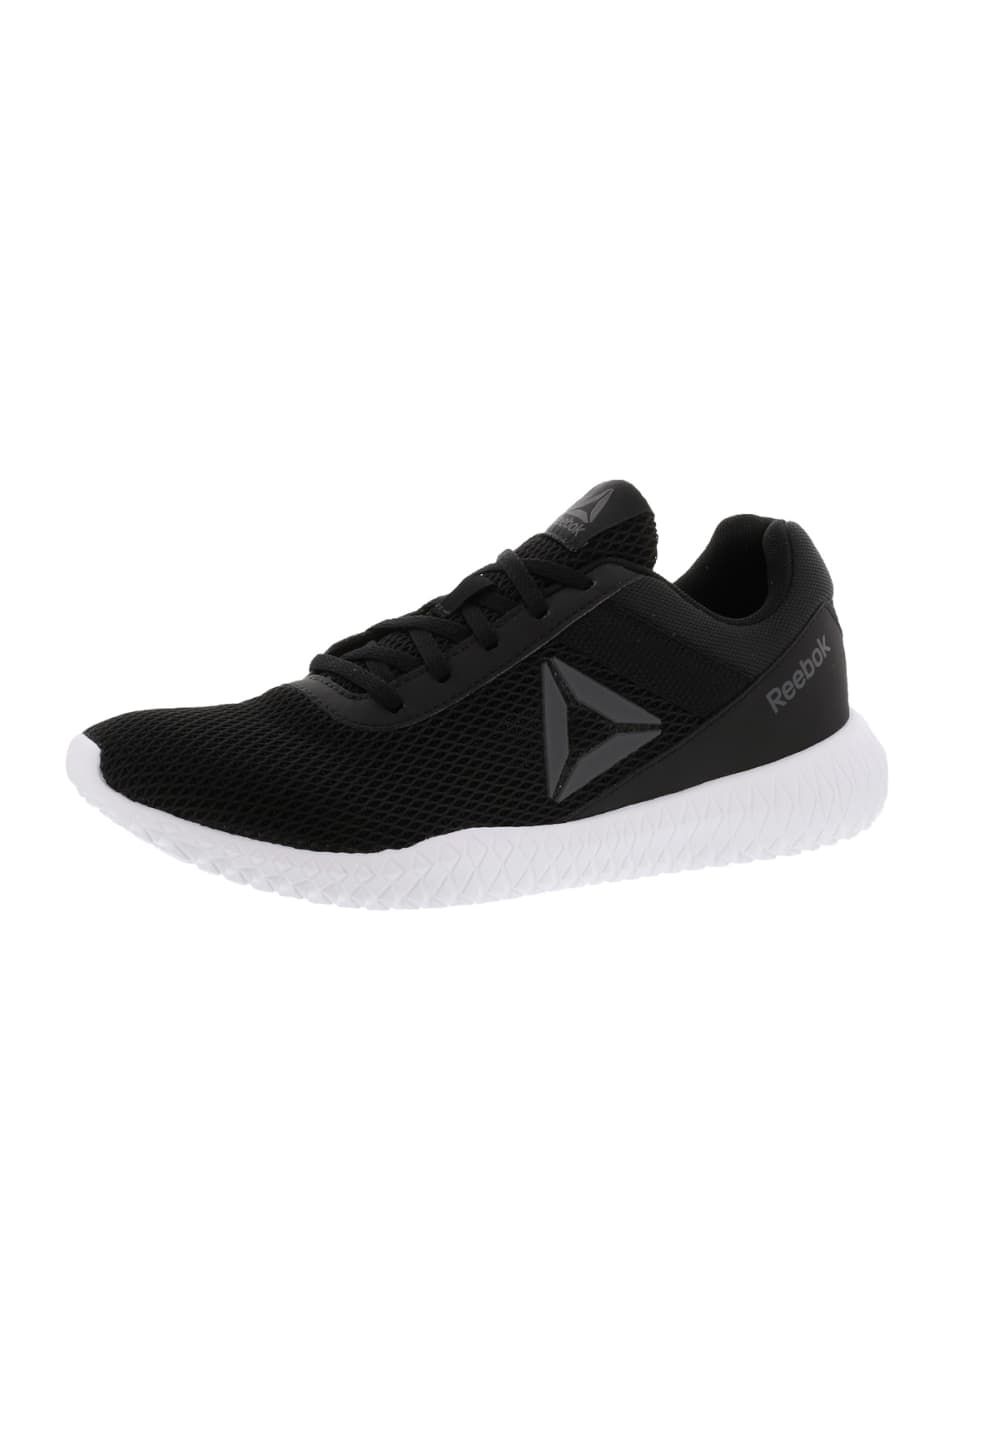 2eb8cb31df Reebok Flexagon Energy - Fitness shoes for Men - Black